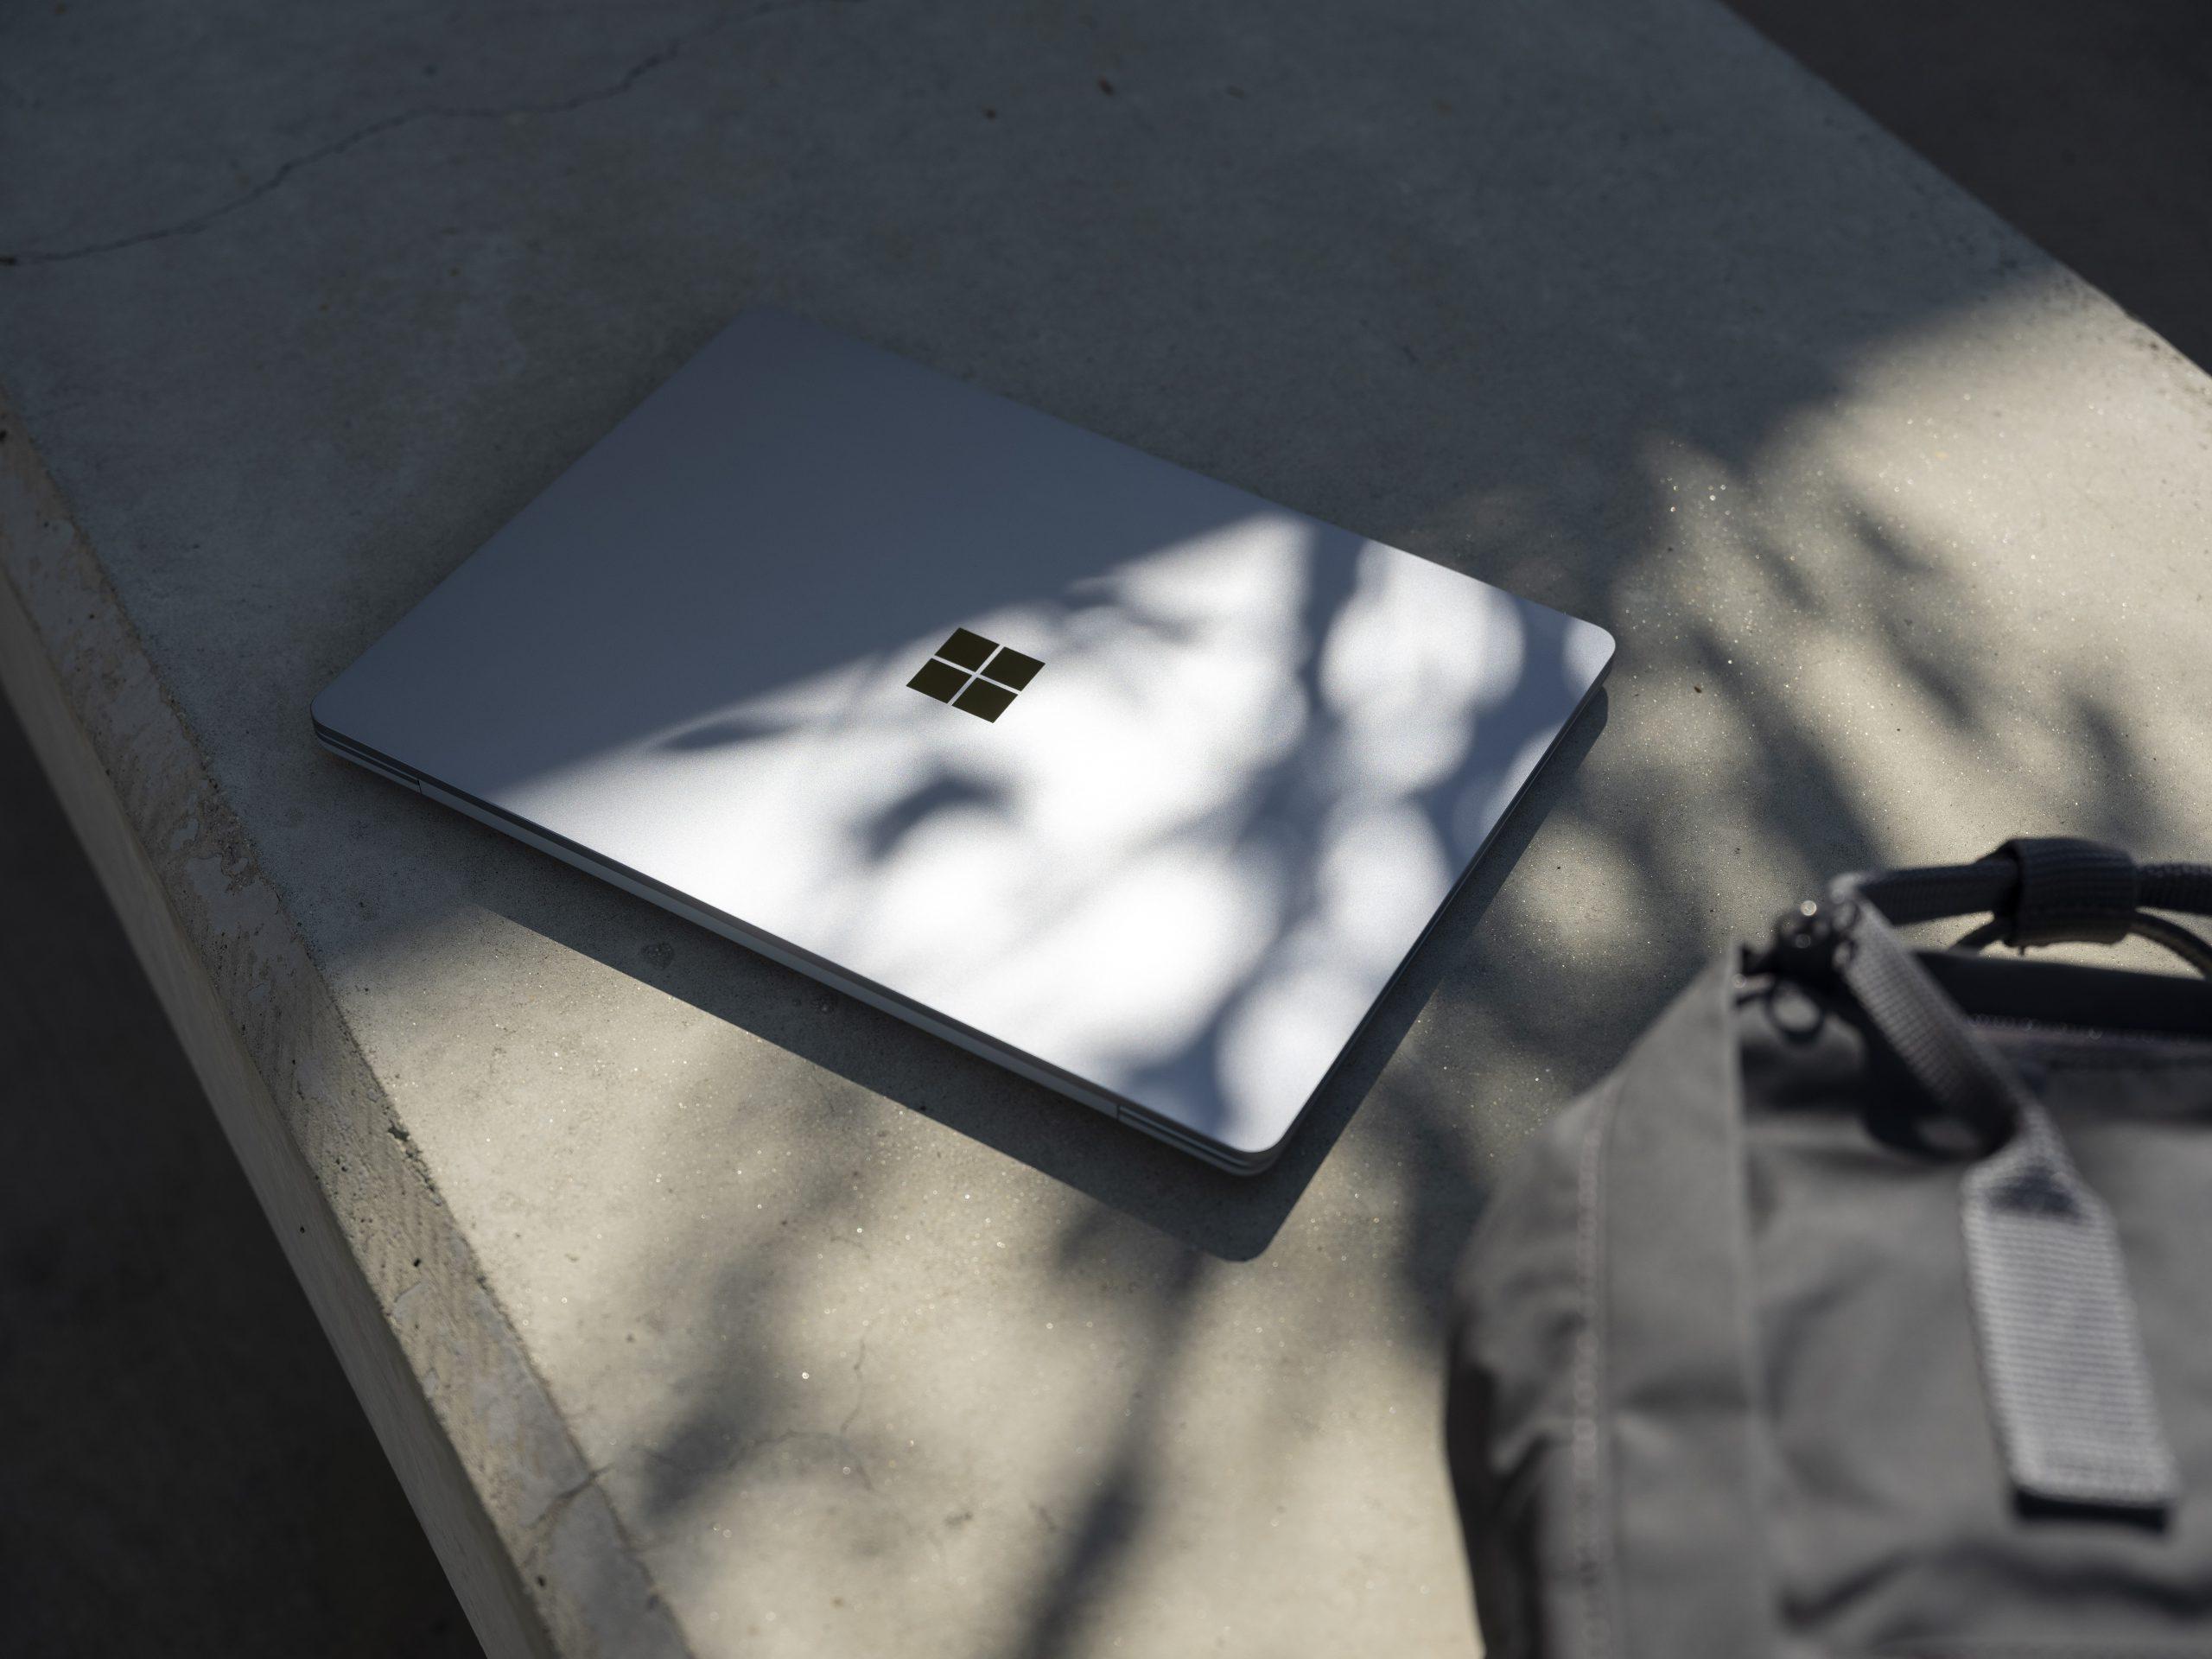 Microsoft device